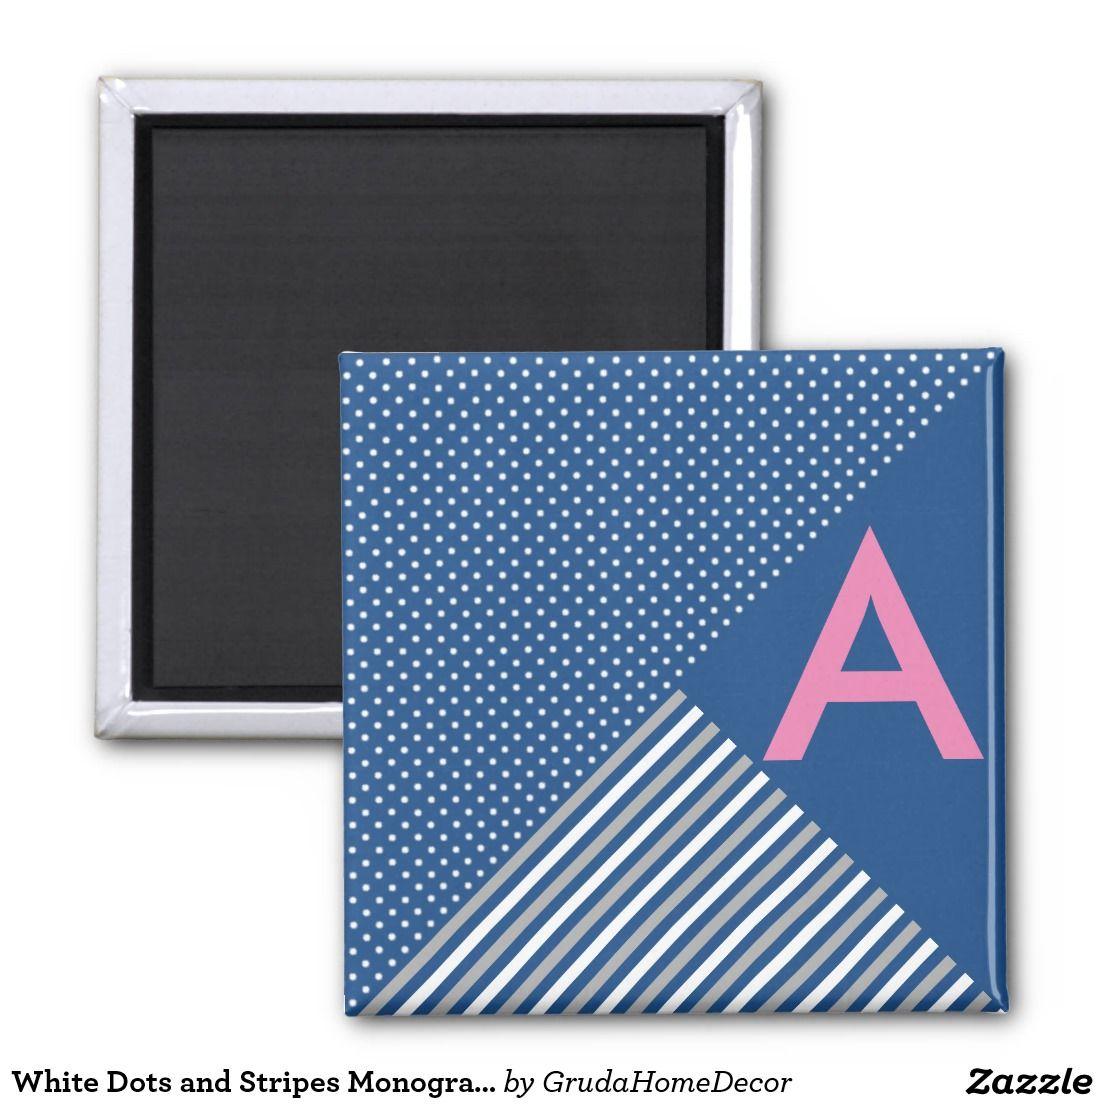 White Dots and Stripes Monogram Magnet